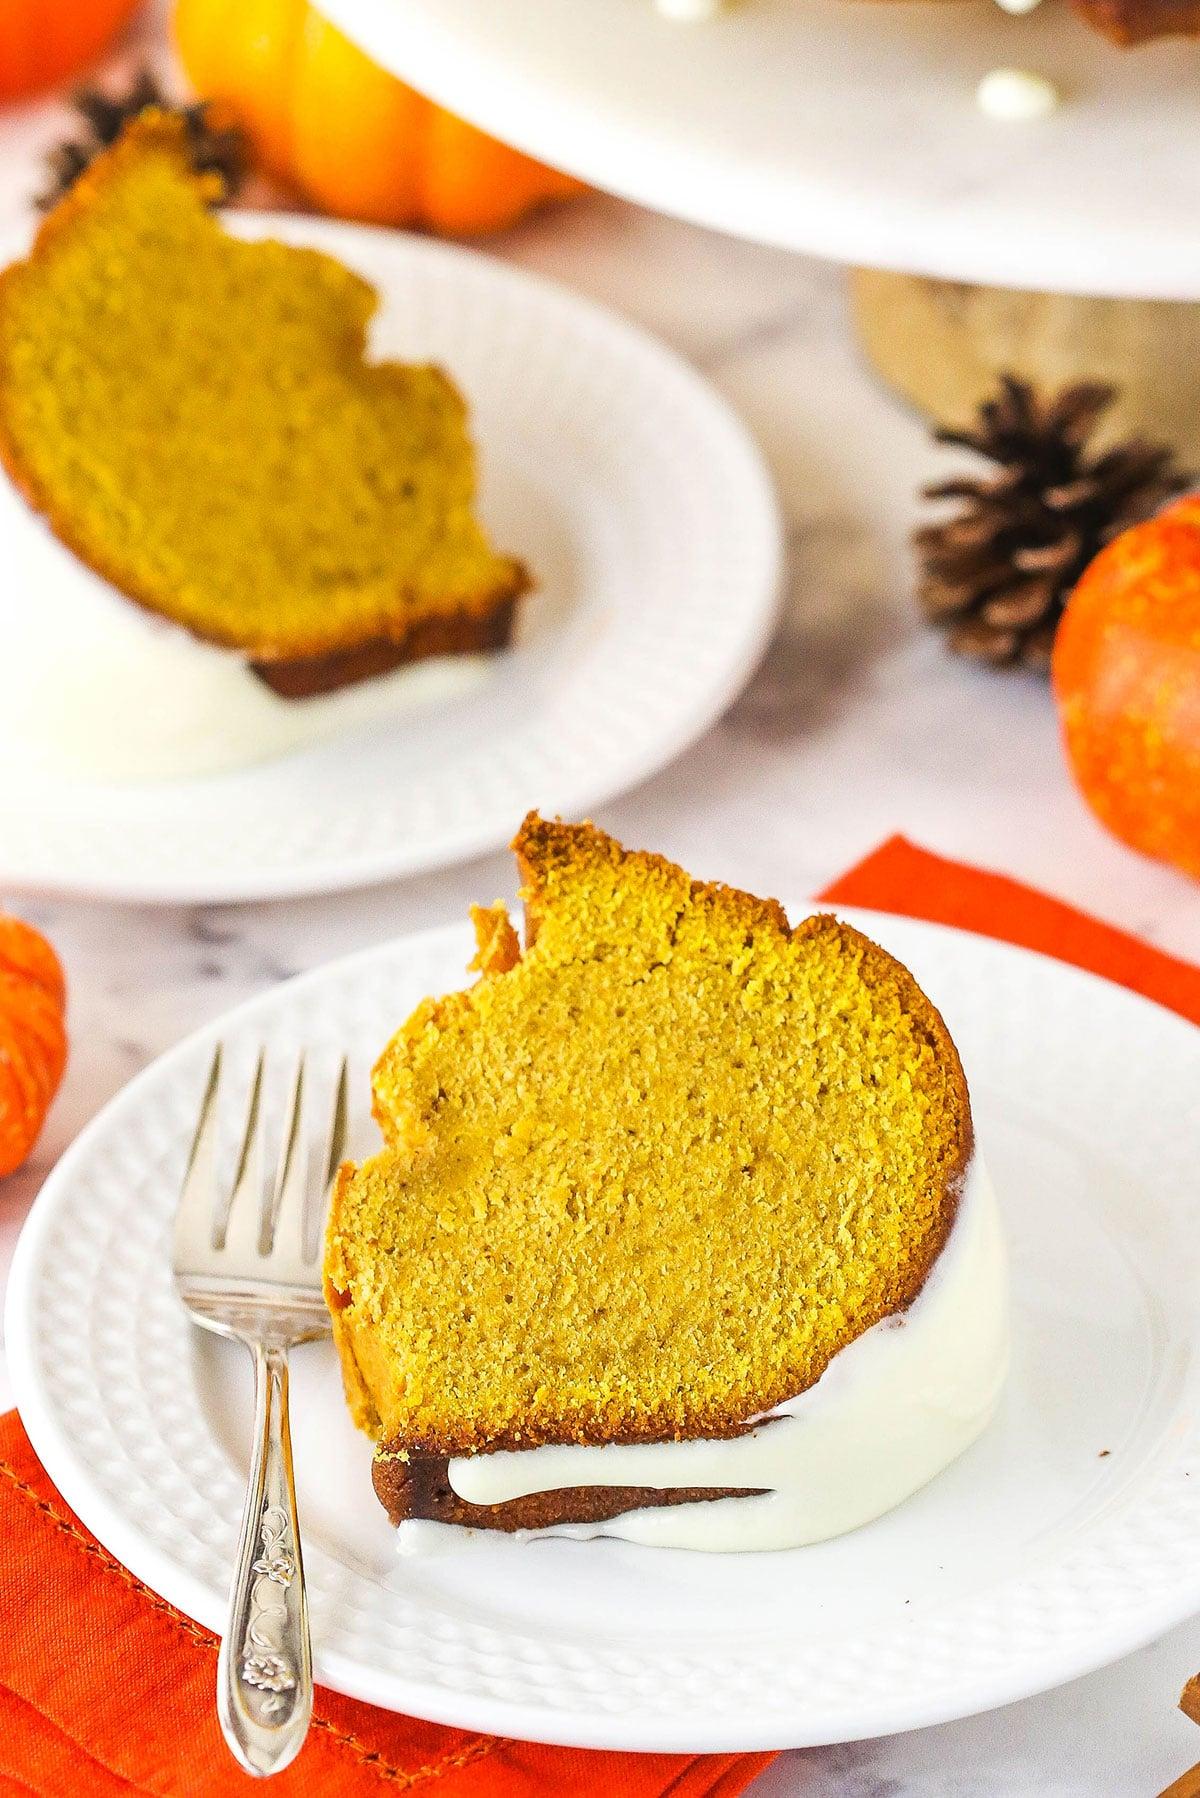 pumpkin pound cake slice on white plate with orange napkin